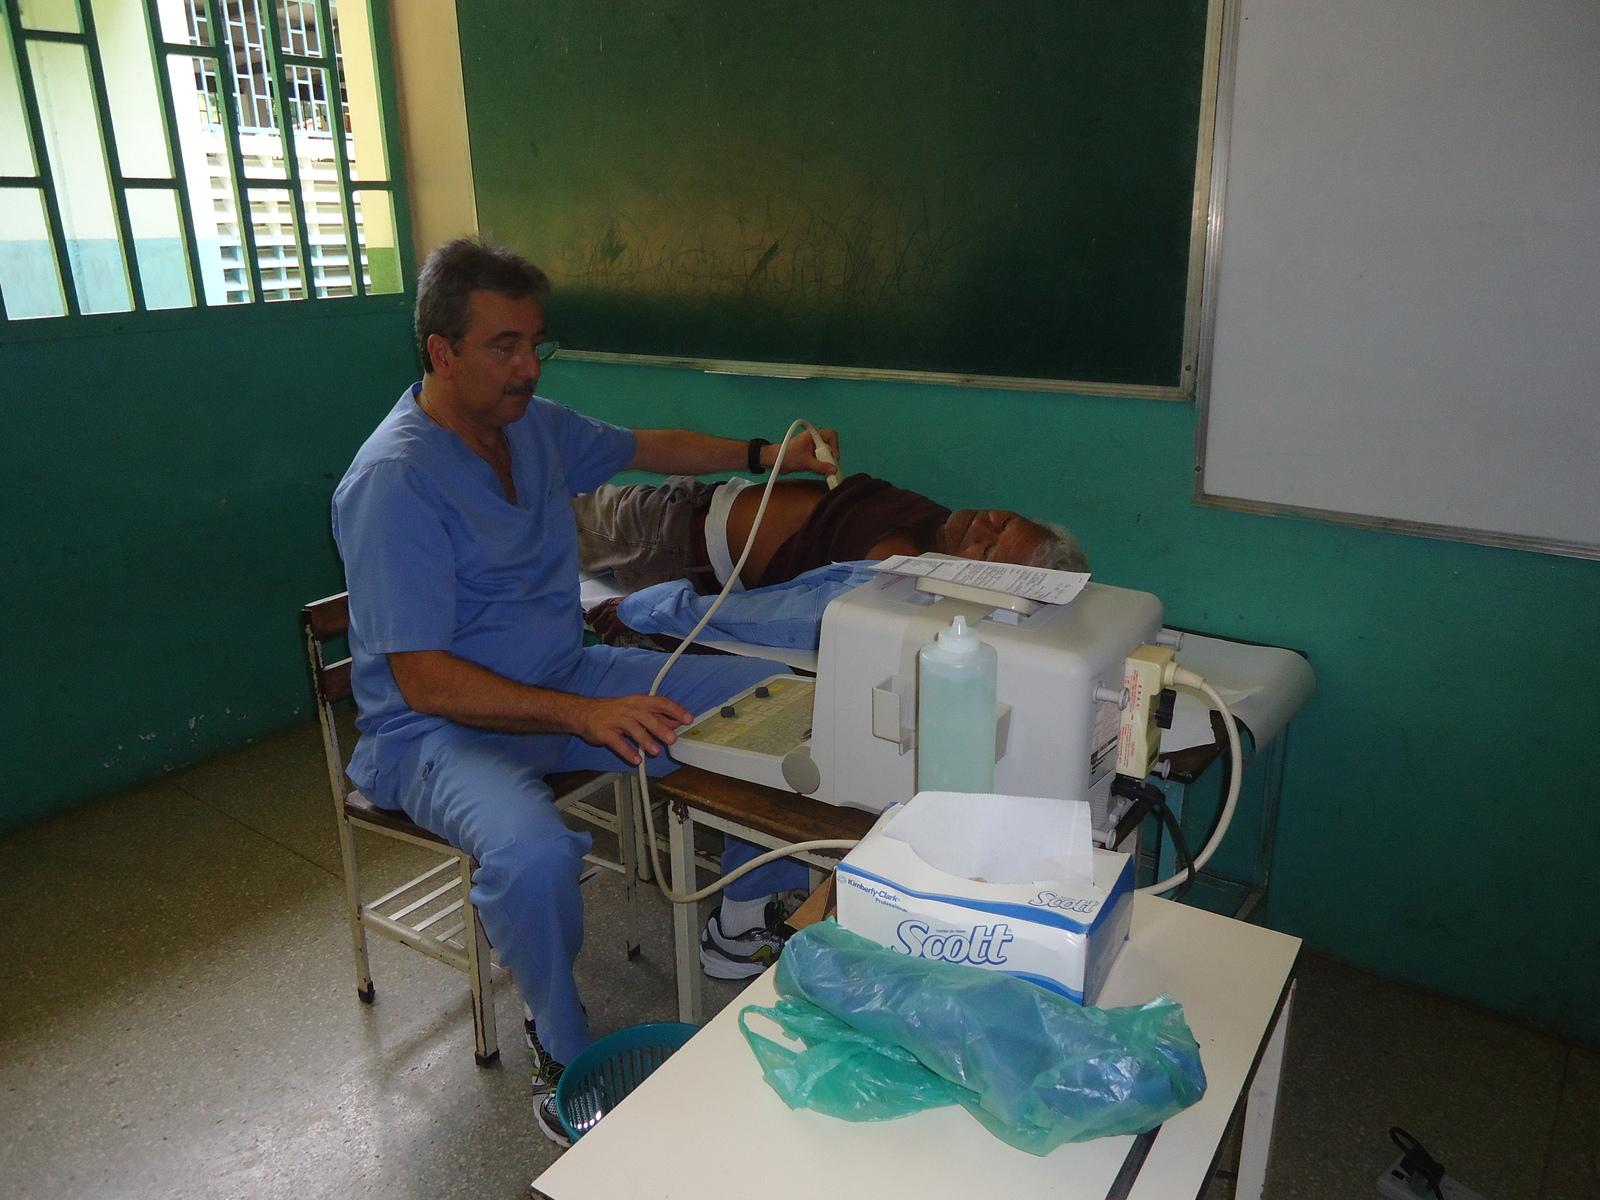 Actividad de atención médica en Macaira, estado Guárico - Dr. Dervis Bandres, gastroenterólogo del CMDLT